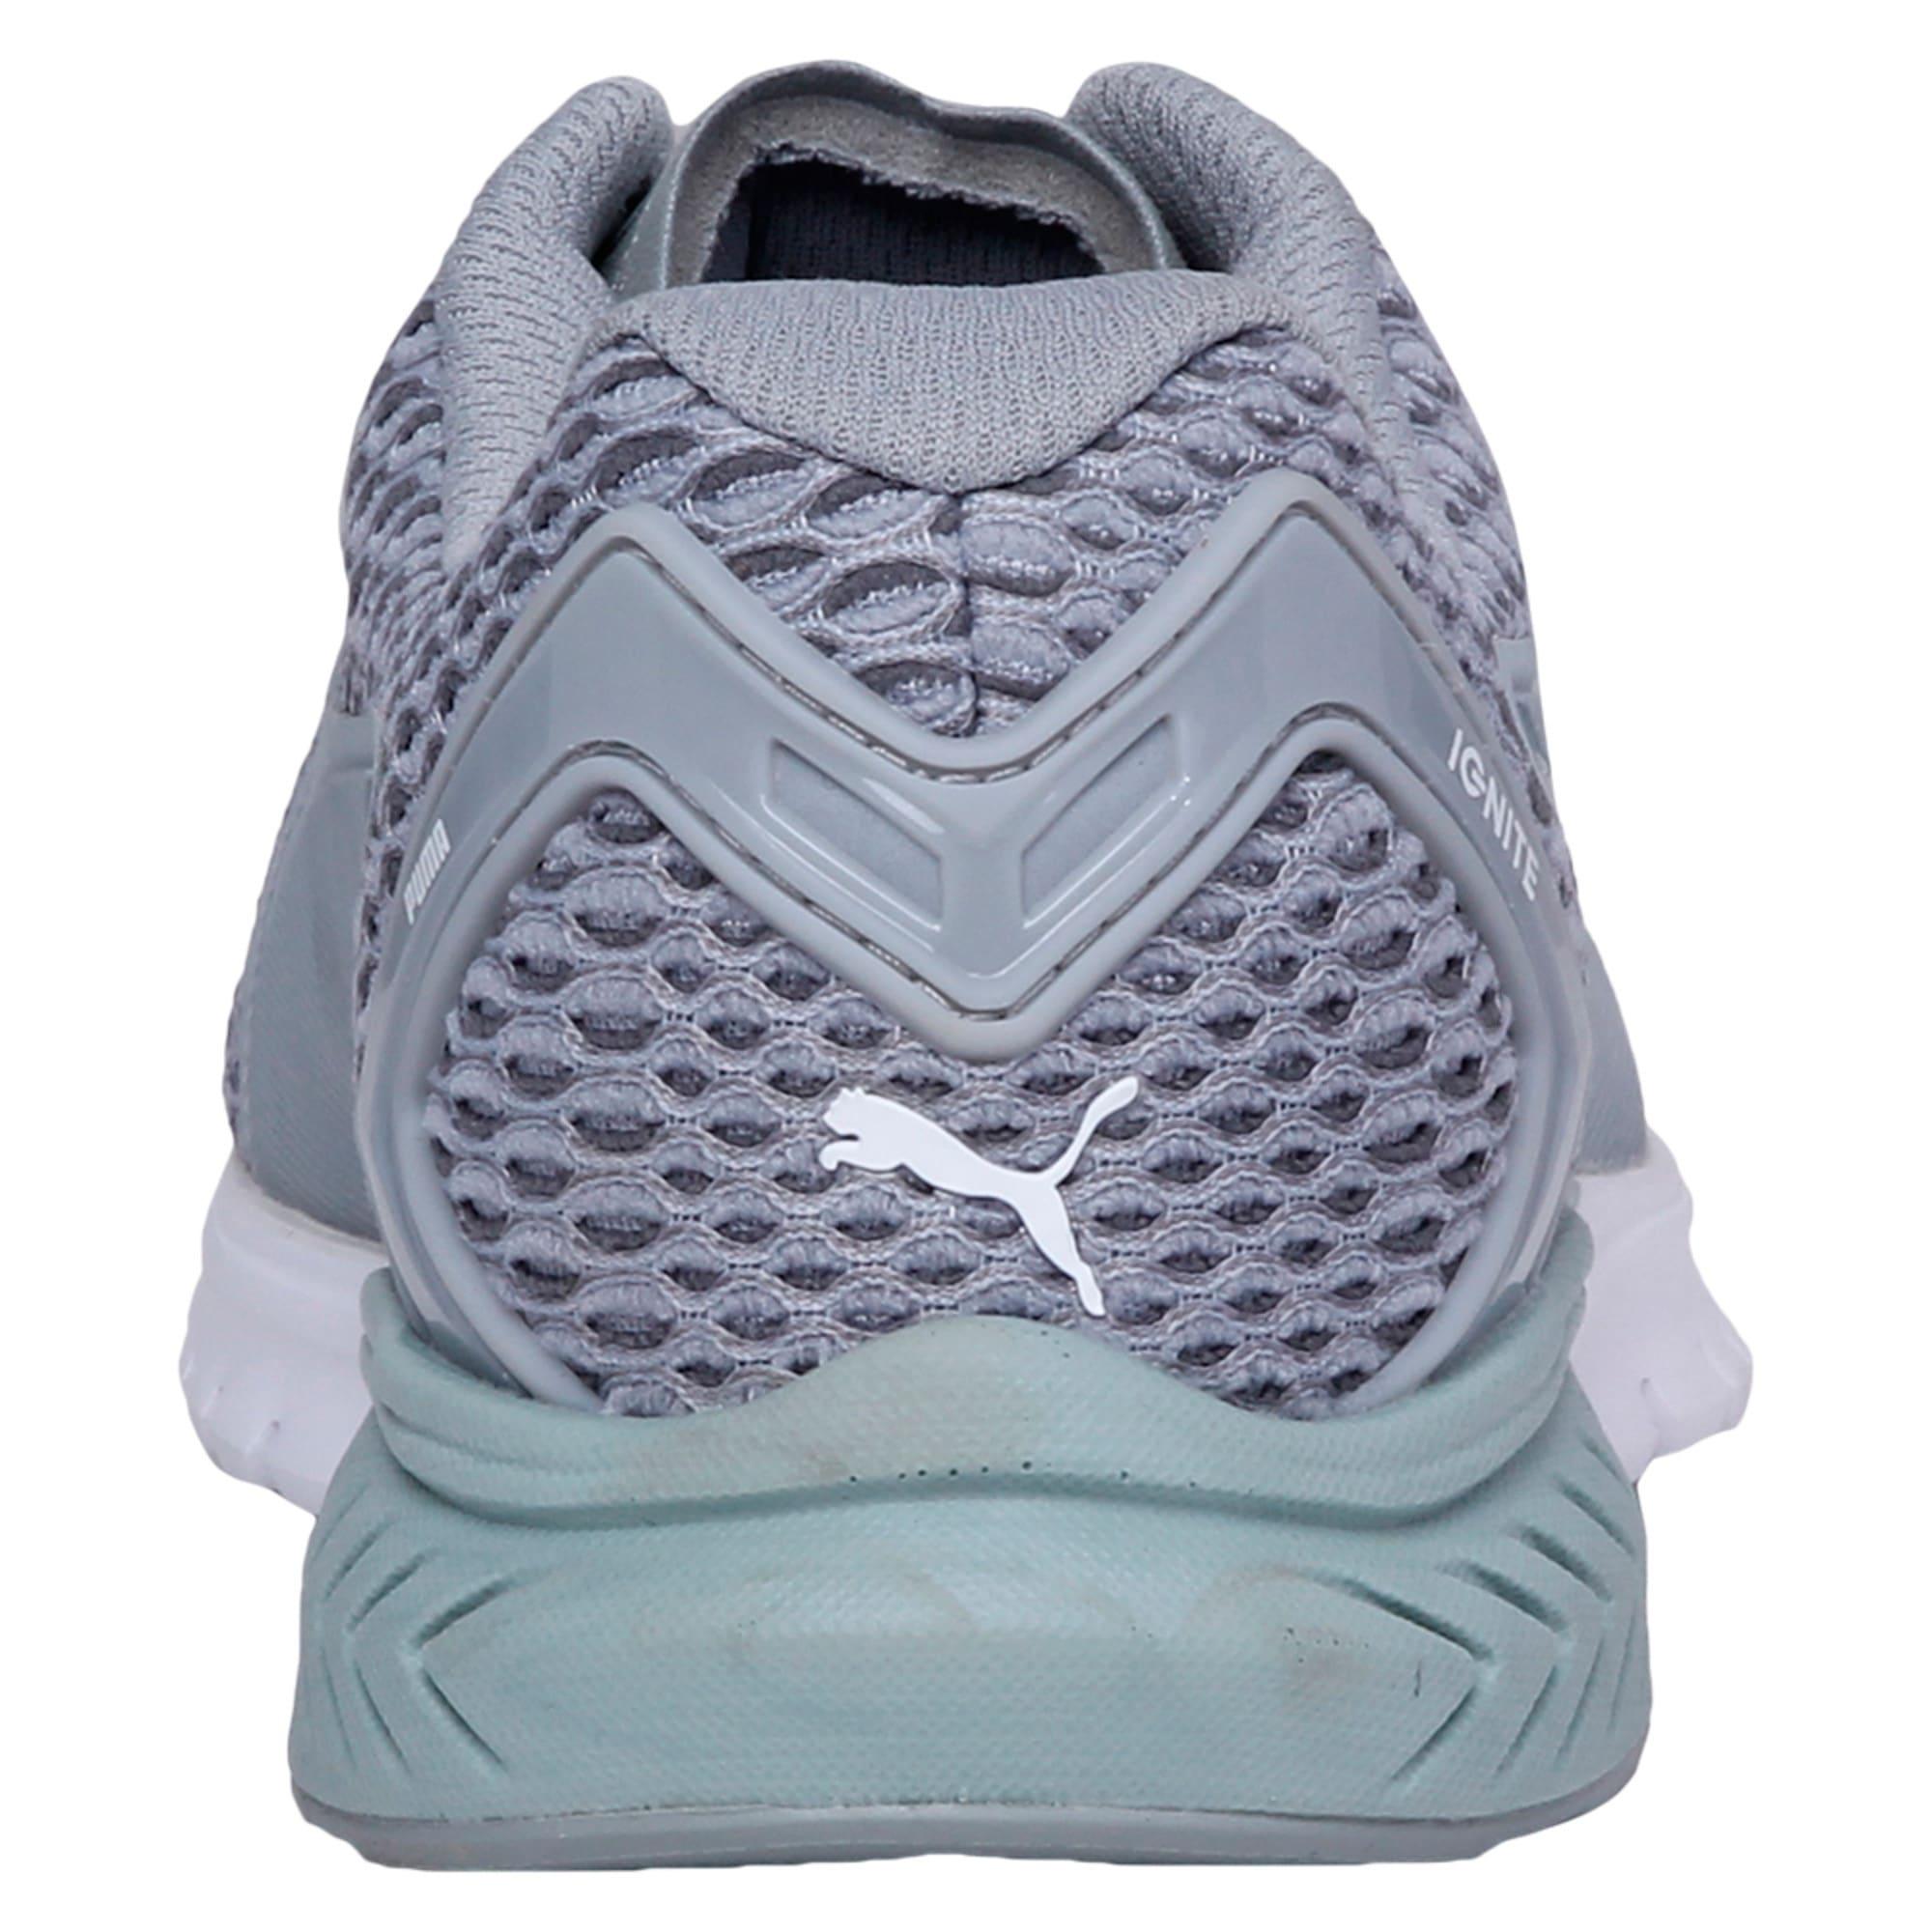 Thumbnail 3 of IGNITE Dual New Core Women's Training Shoes, Quarry-QUIET SHADE, medium-IND